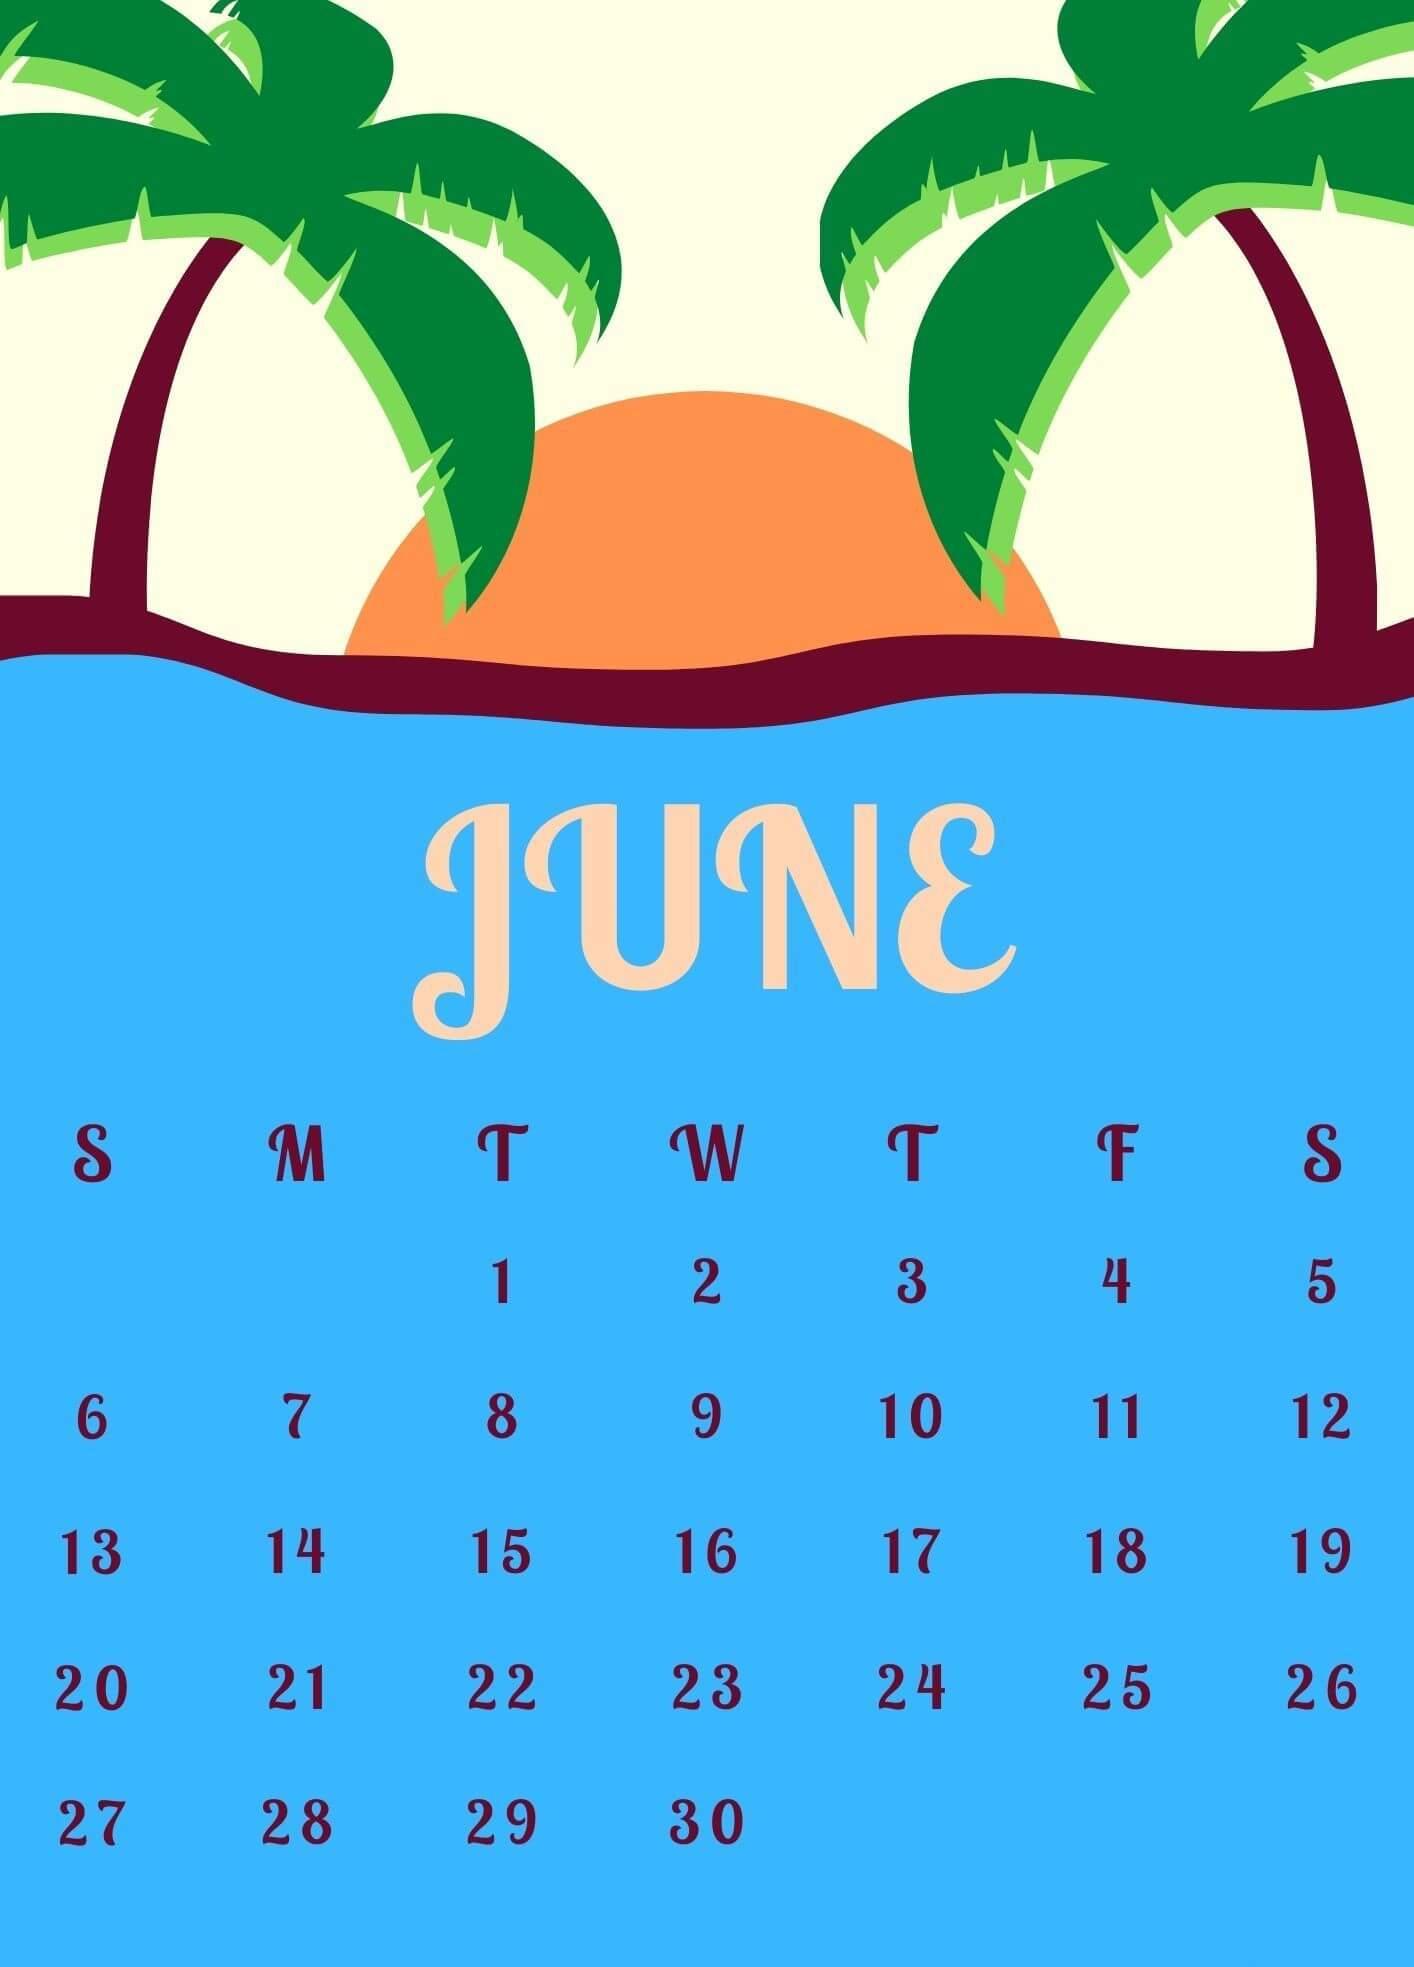 June 2021 Calendar For iPhone